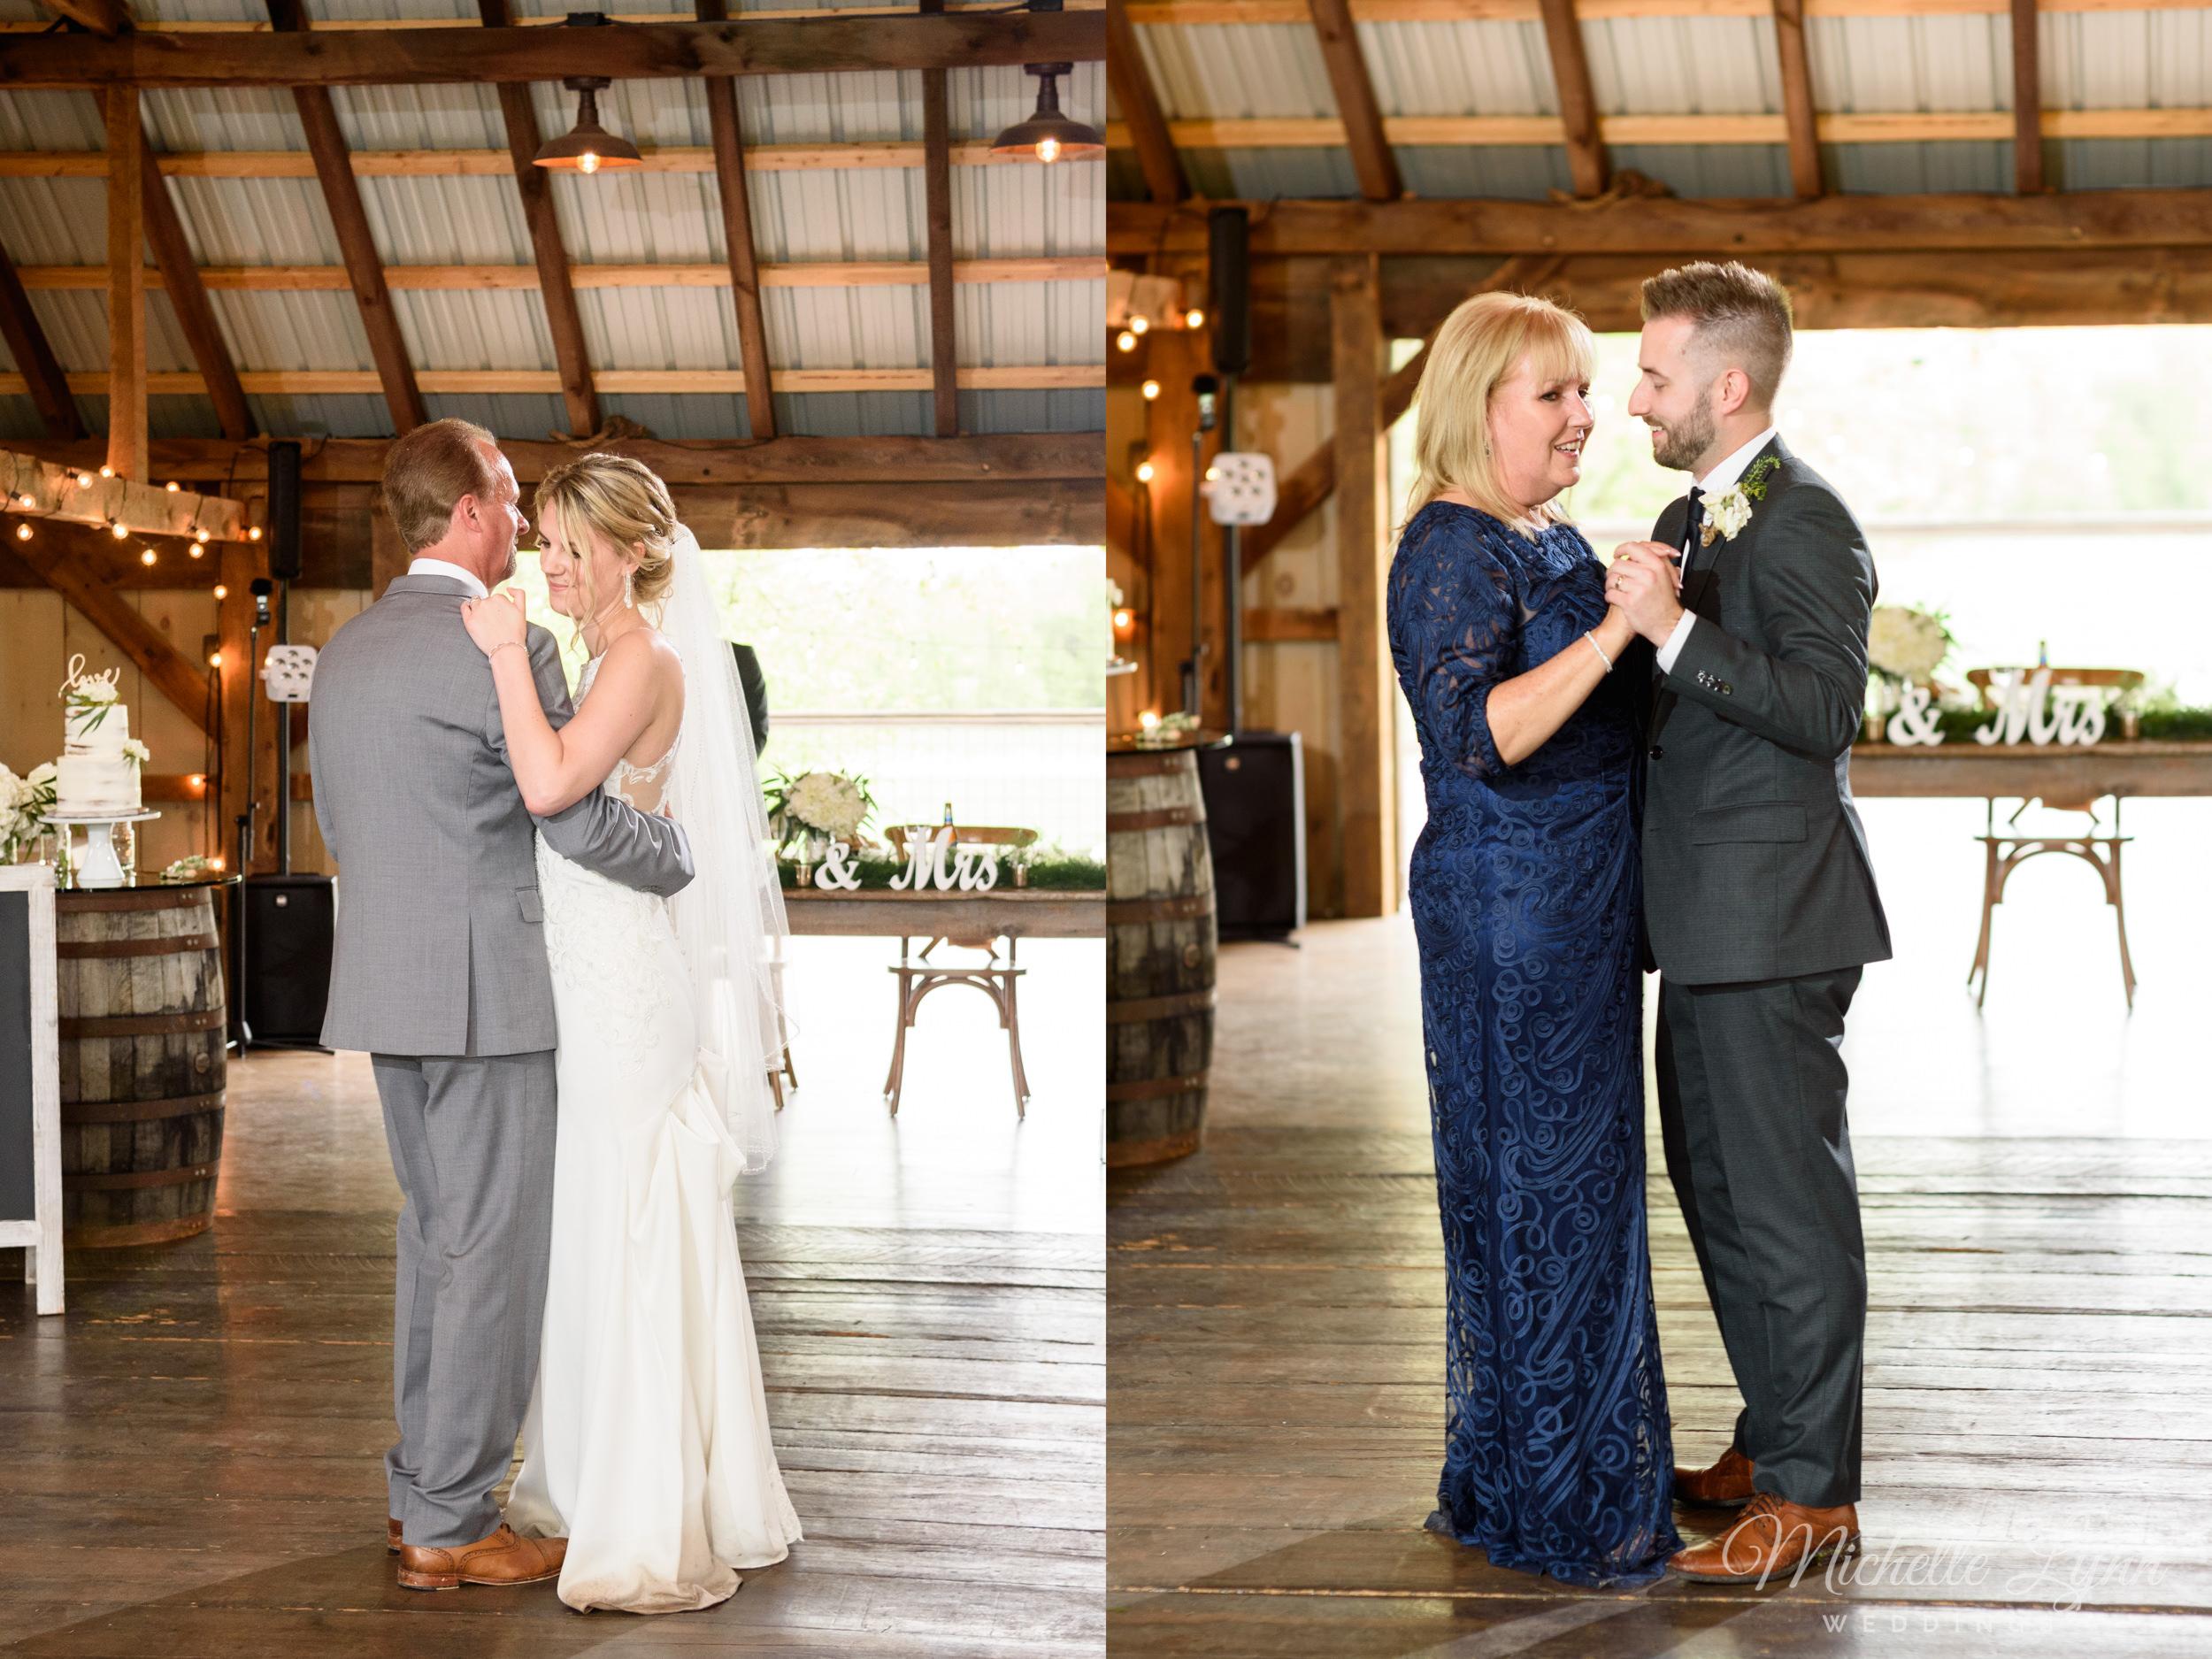 mlw-the-farm-bakery-and-events-wedding-photos-66.jpg